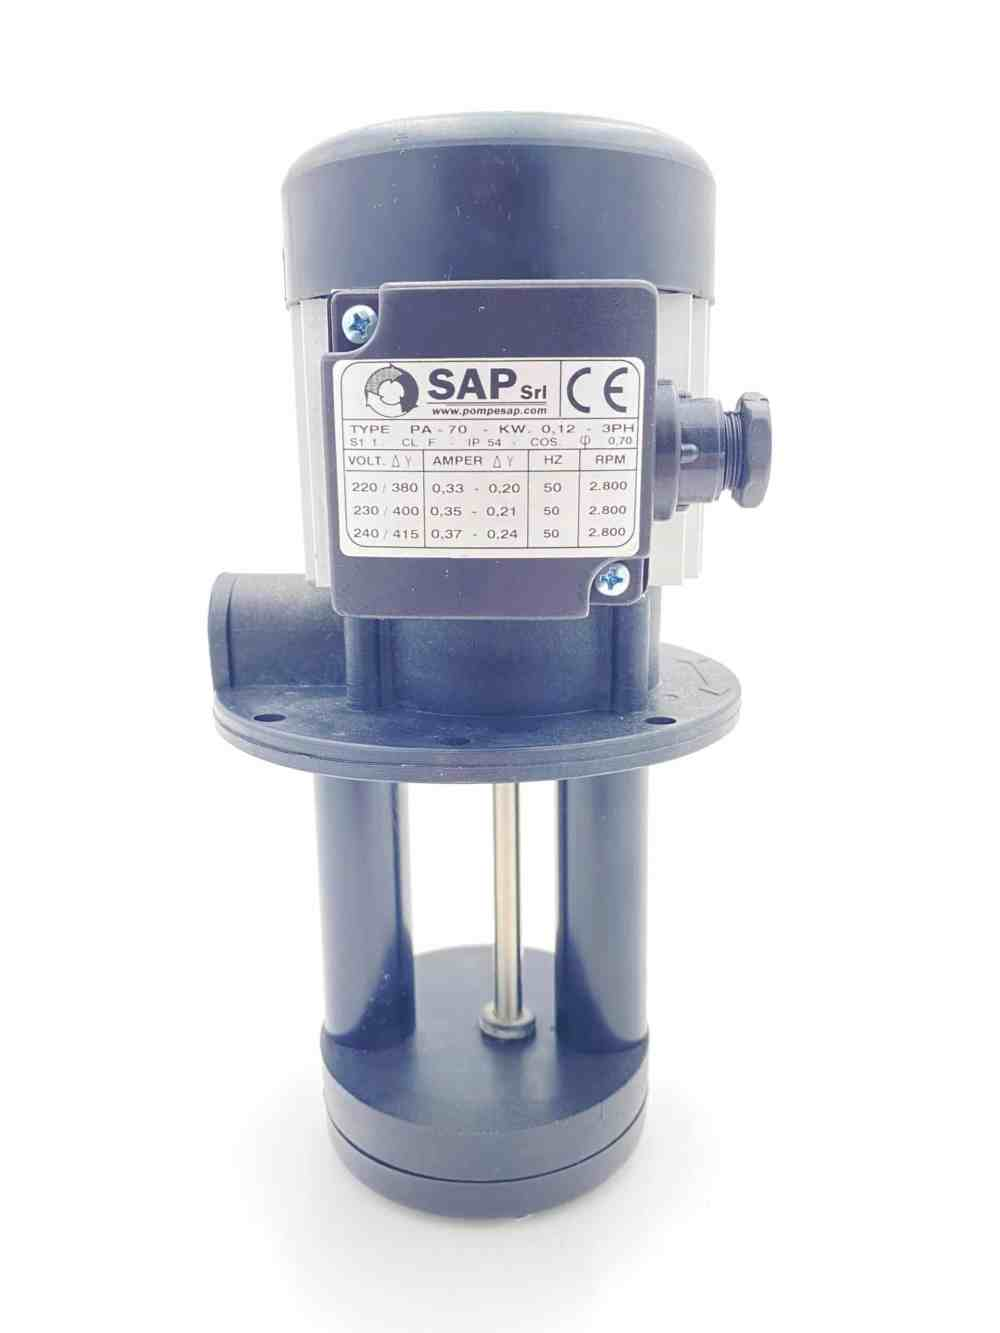 PA-70 SAP Coolant Pump for 3 Phase RMT Bandsaws - RMTPH0001